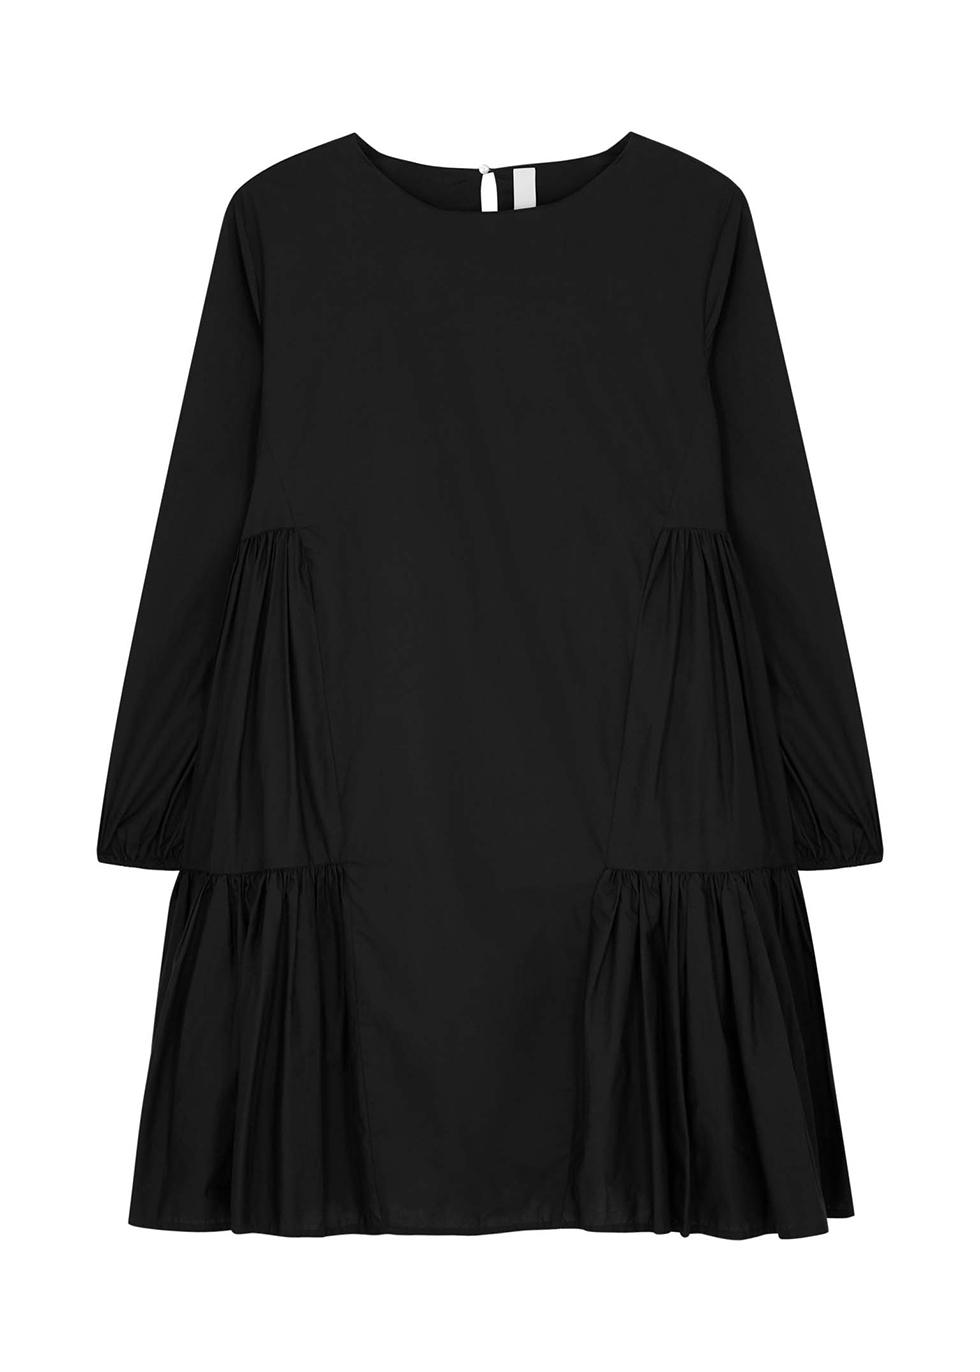 Byward black cotton mini dress